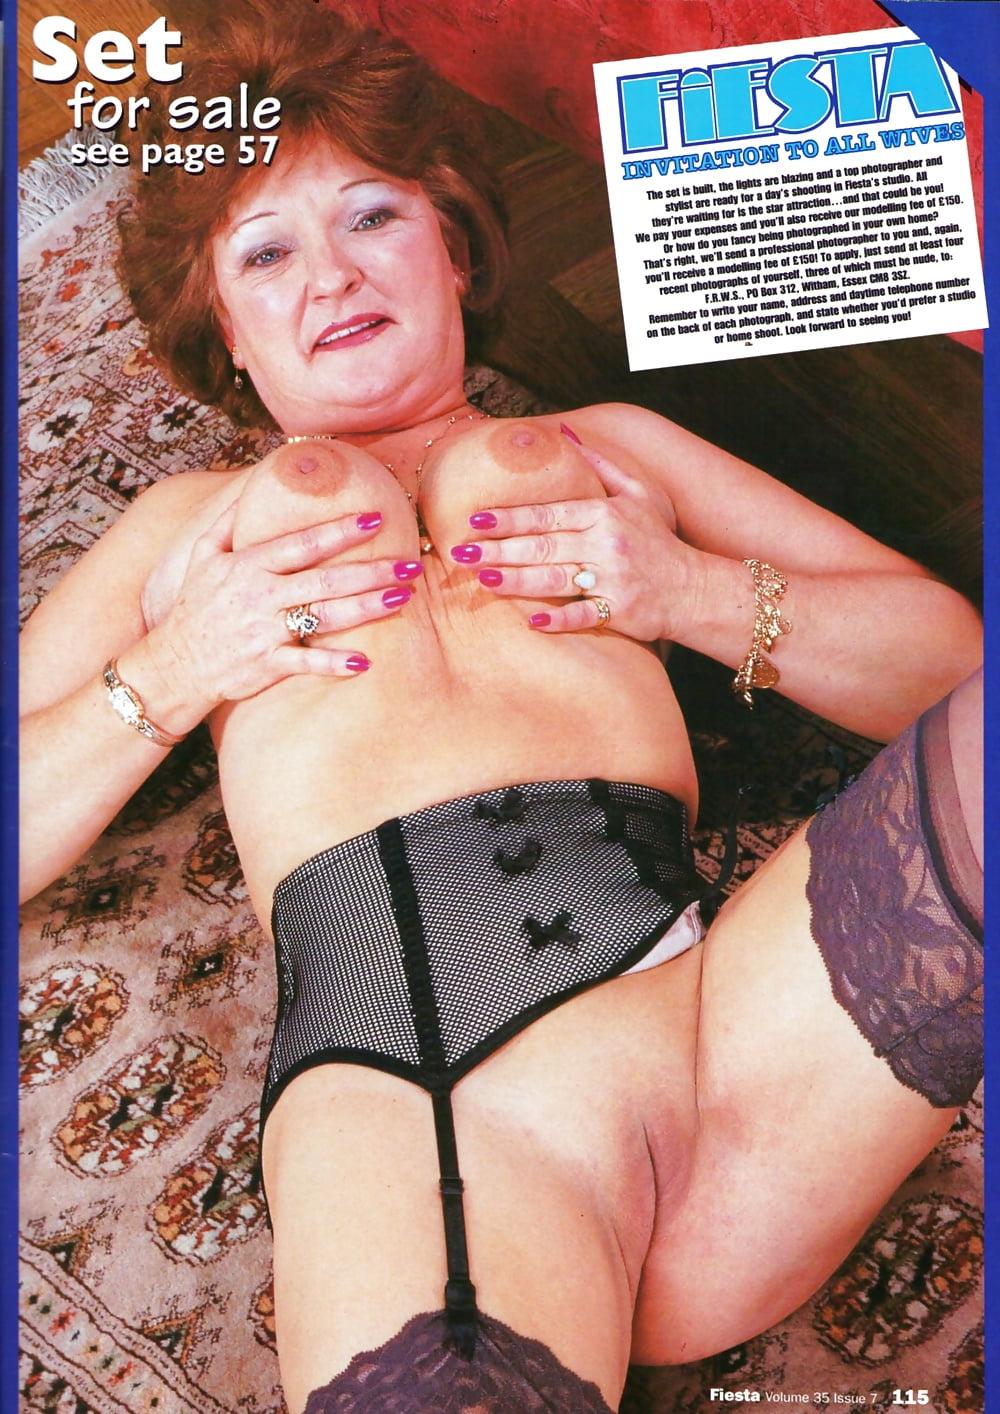 Bbw Porn Magazine fiesta magazine reader's wives - 139 pics - xhamster